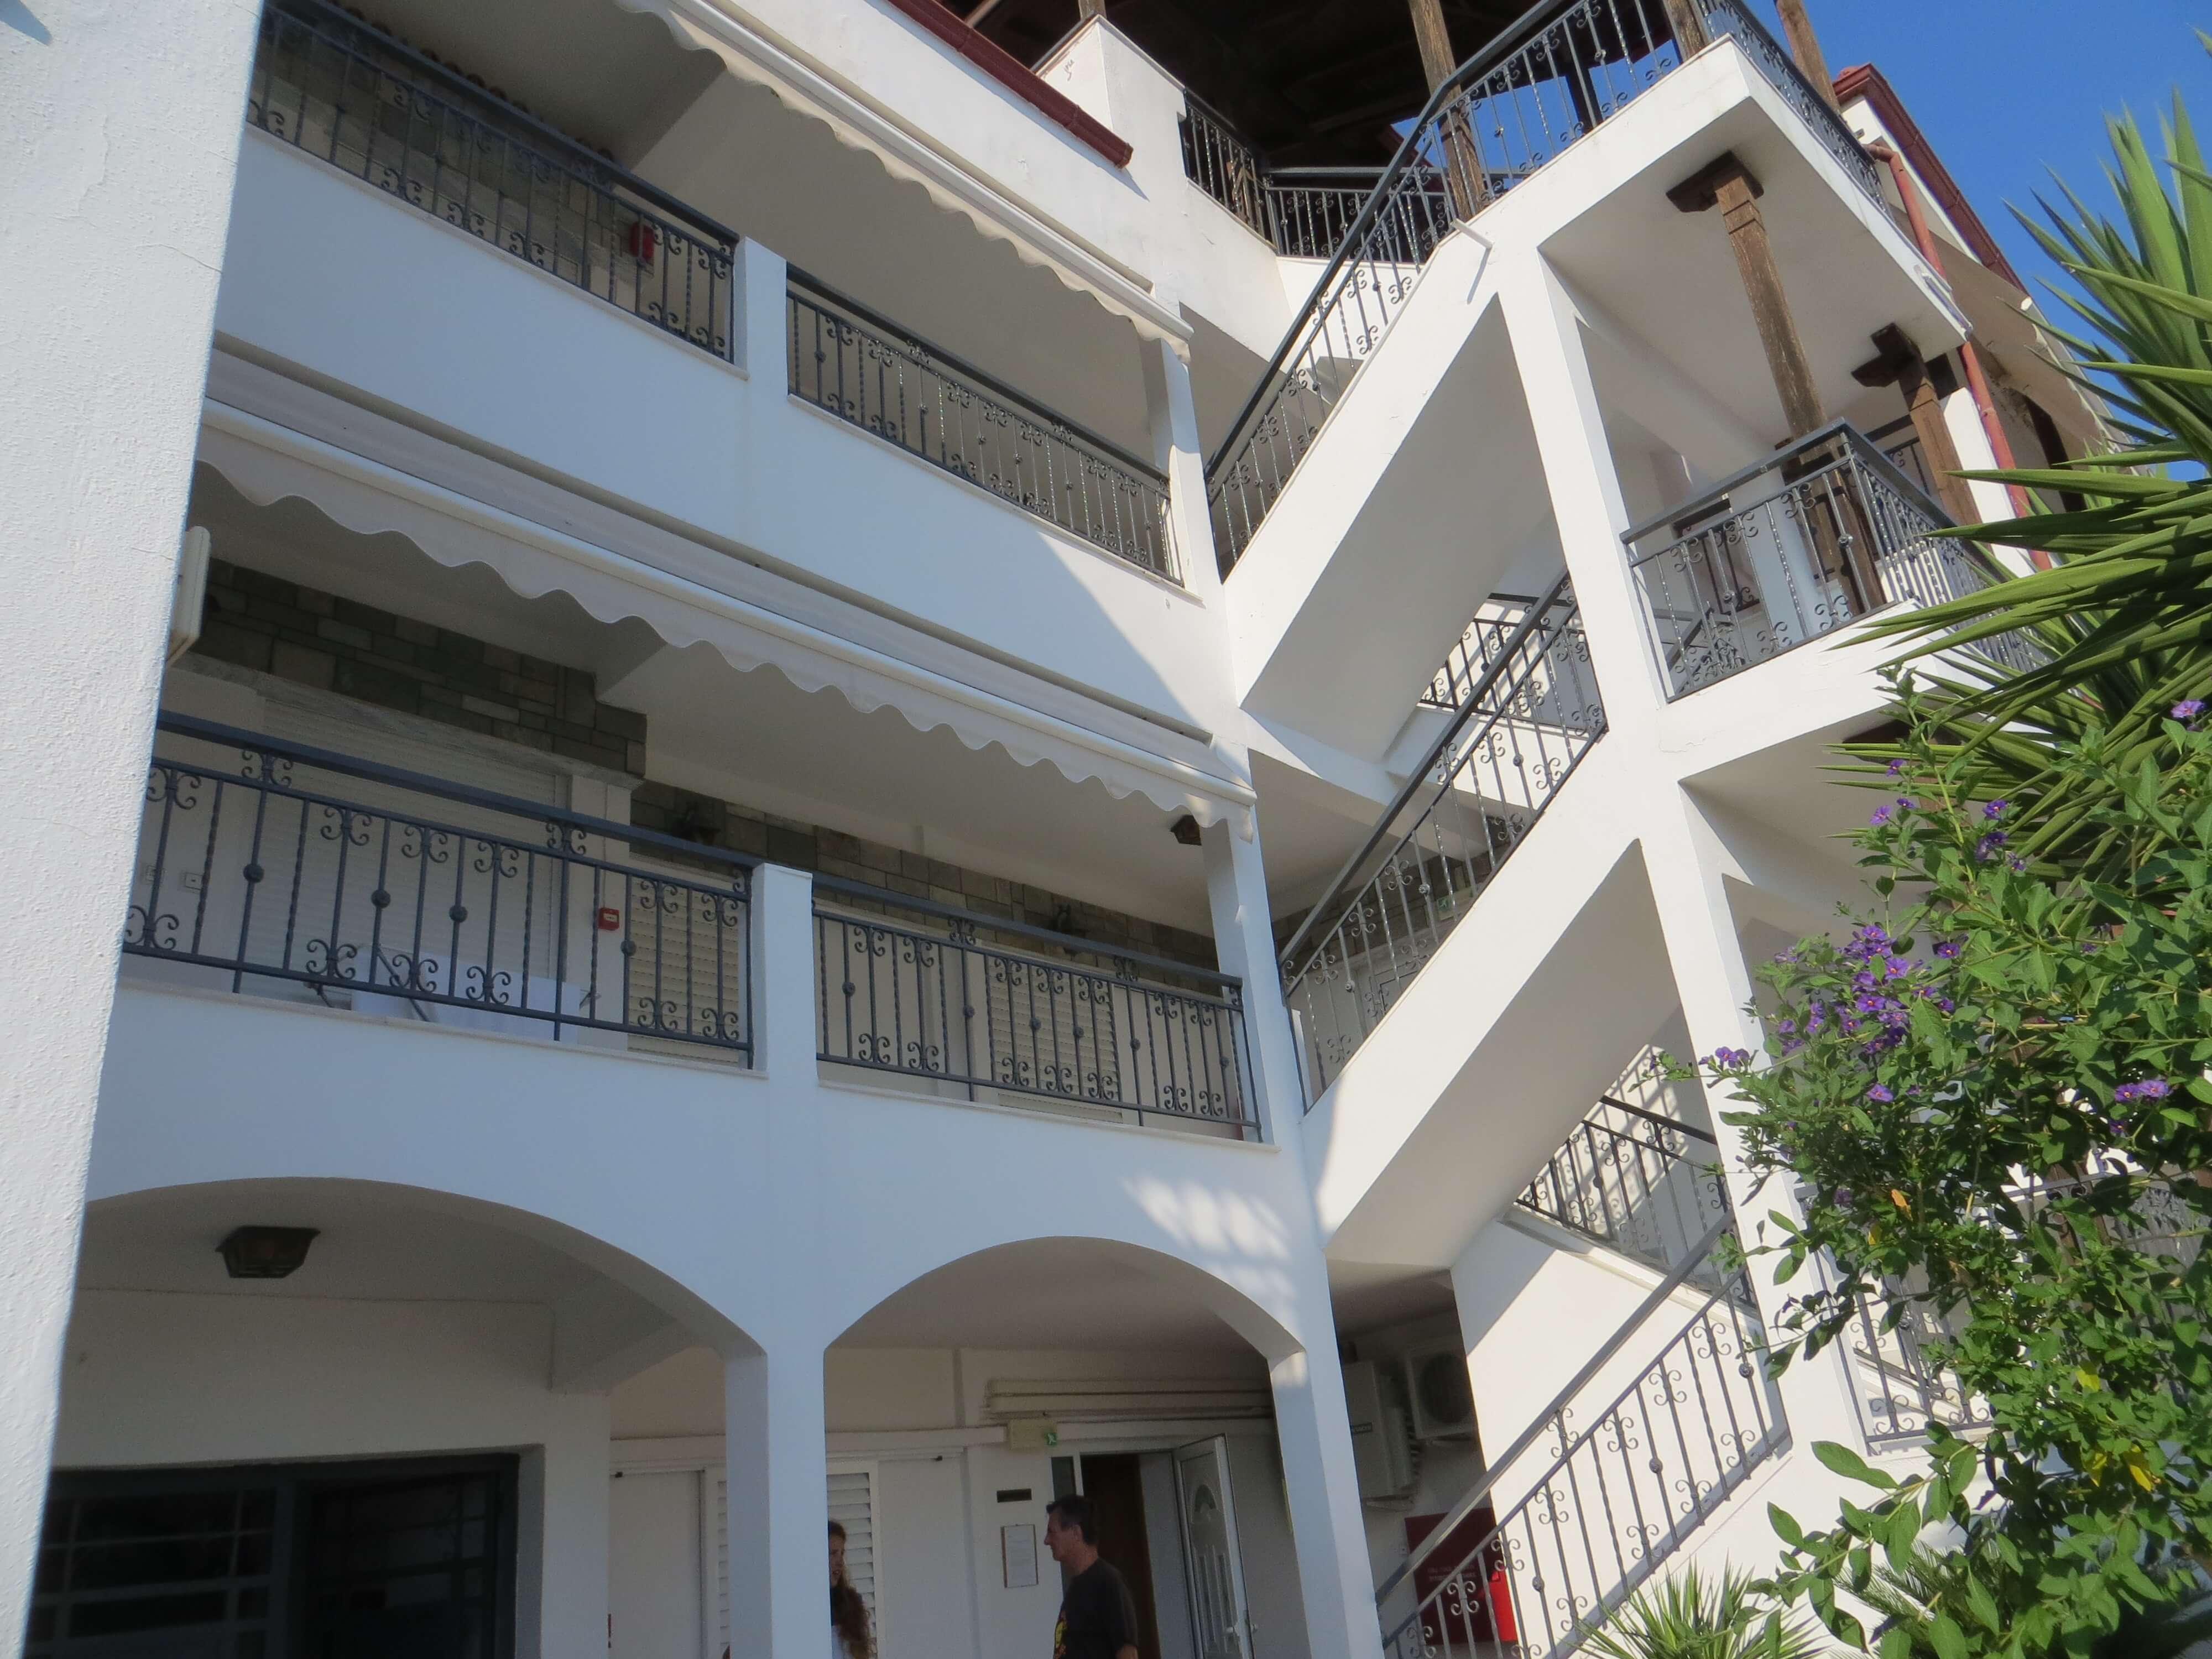 http://www.andromeda-sarti.com/wp-content/uploads/2016/02/Apartmany_dovolenka_grecko_sarti_6.jpg